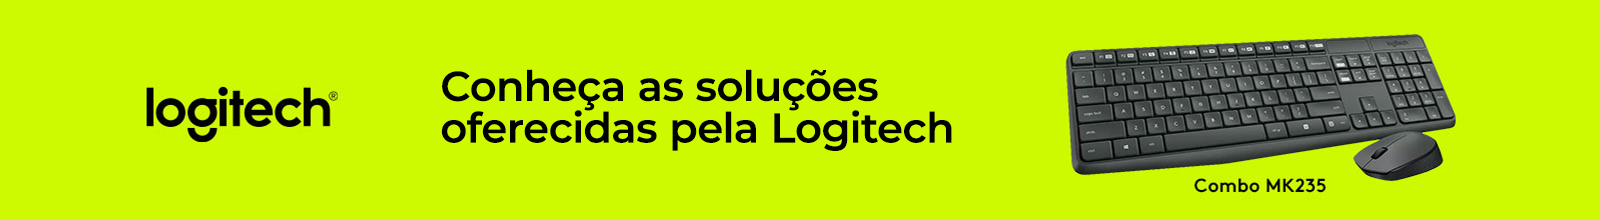 Loja Logitech